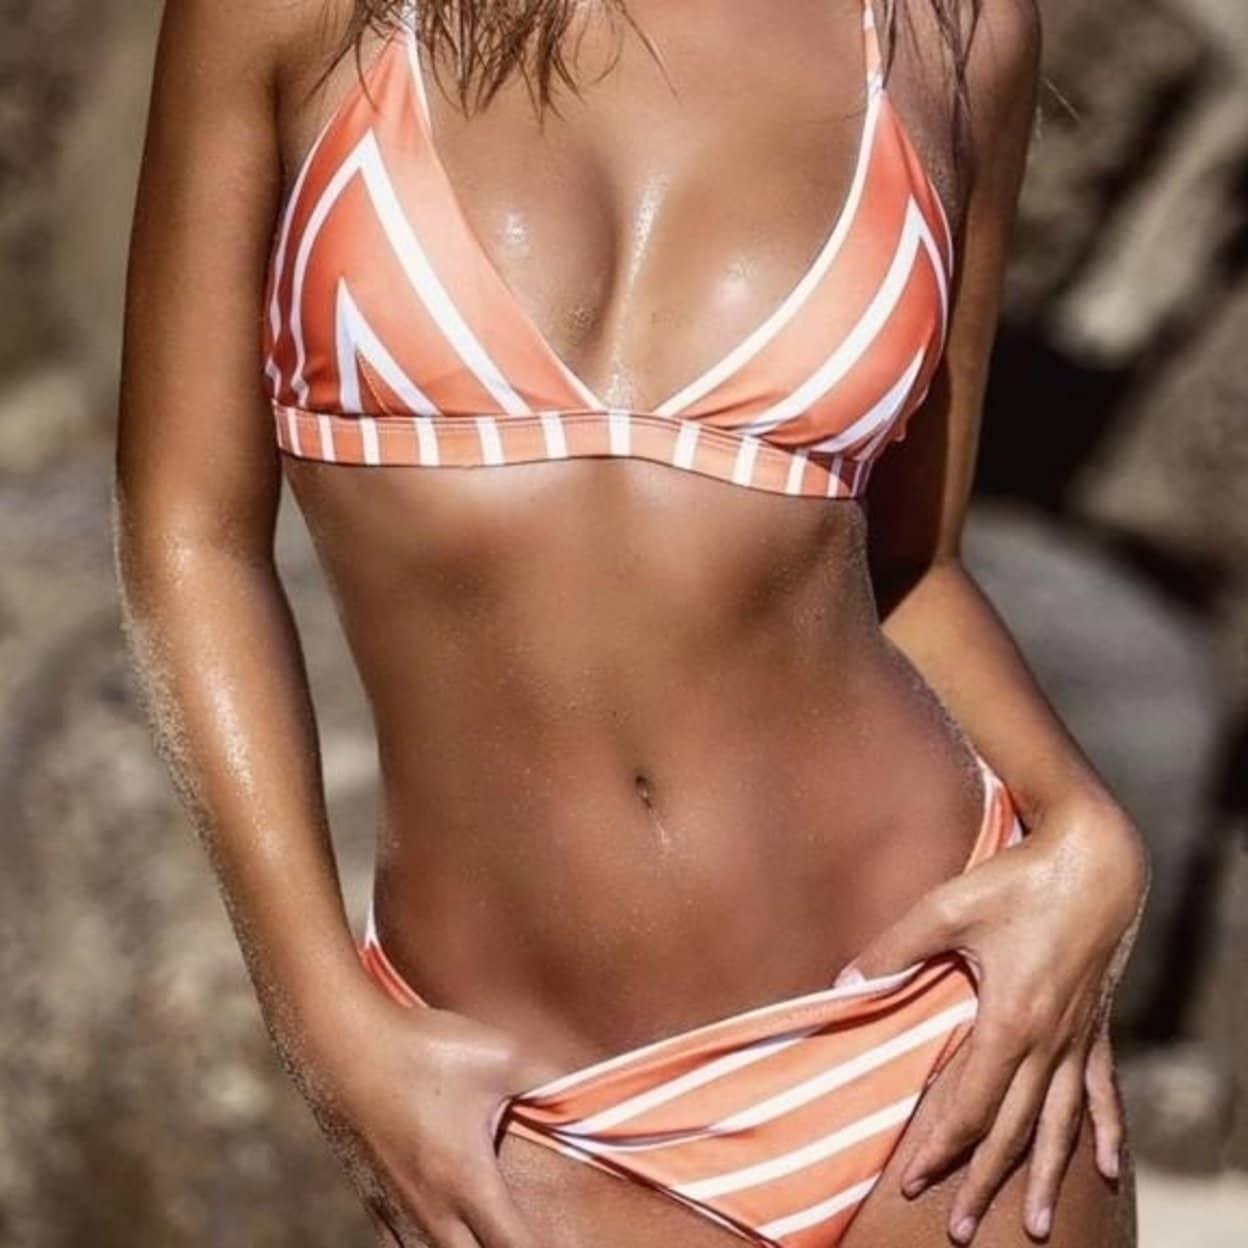 129c1cc4861753 Shop [EAST LIFE LI] Hot Sale Women Bikini Set Striped Swimwear Female Sexy  Push Up Halter Swimsuit Bathing Suit Summer Beachwear - Free Shipping On  Orders ...